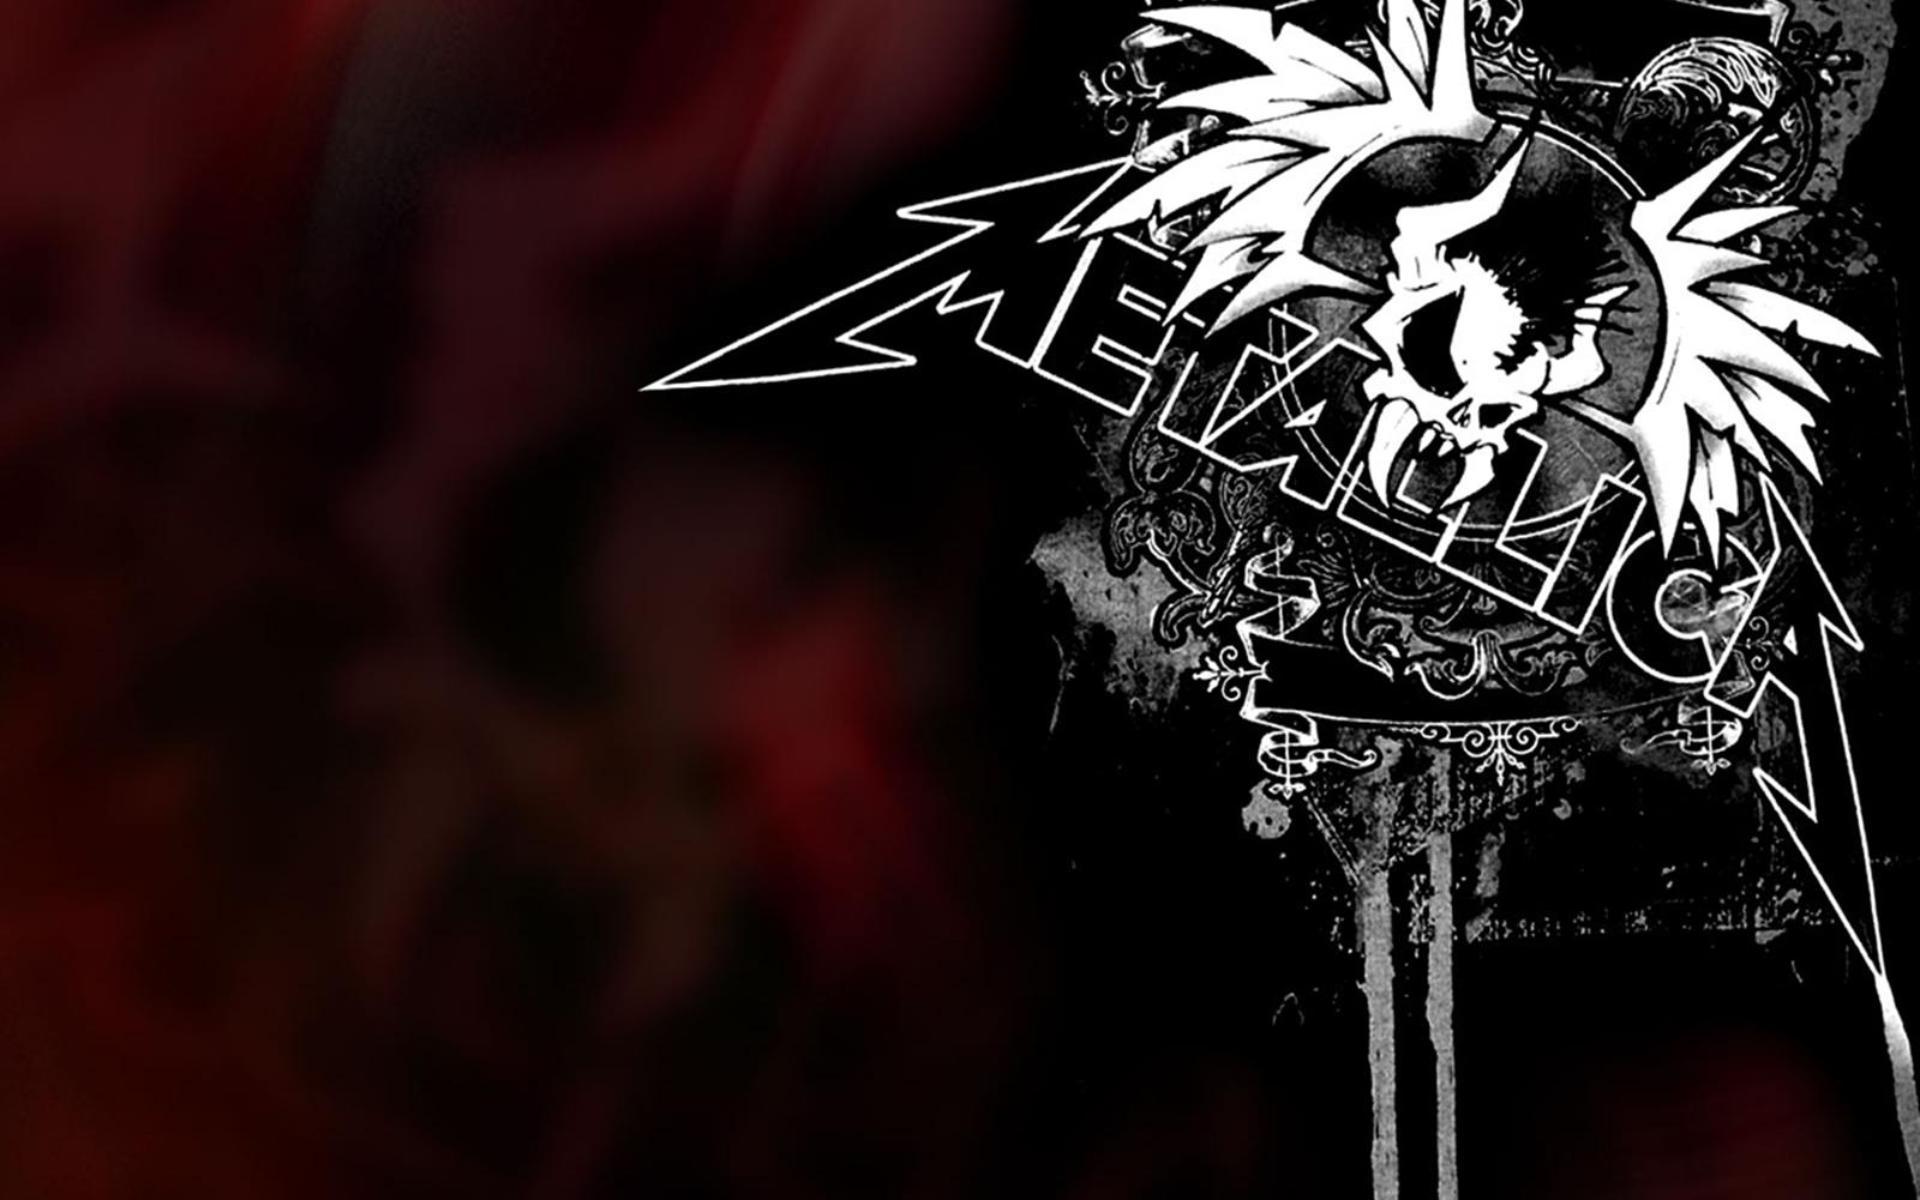 Enjoy our wallpaper of the week Metallica Metallica wallpapers 1920x1200